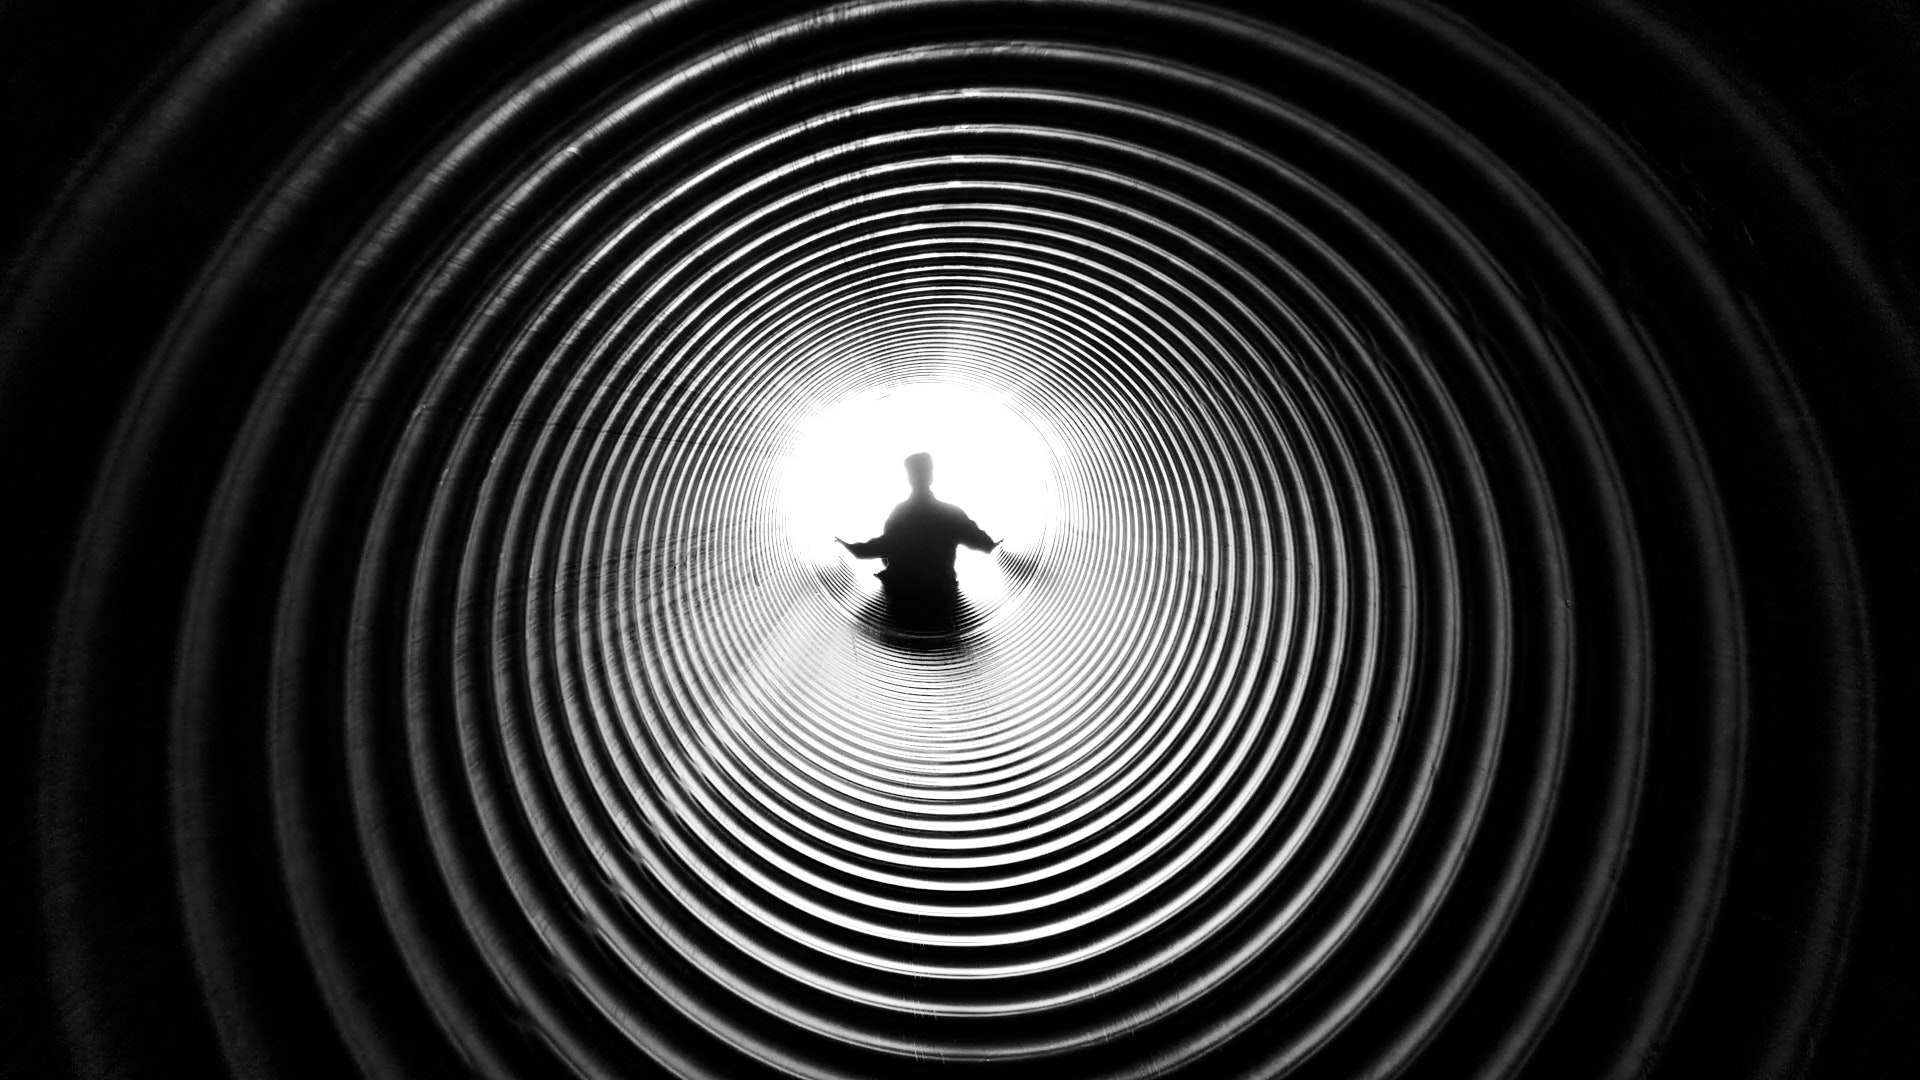 Klaustrophobie – Die Angst vor engen Räumen